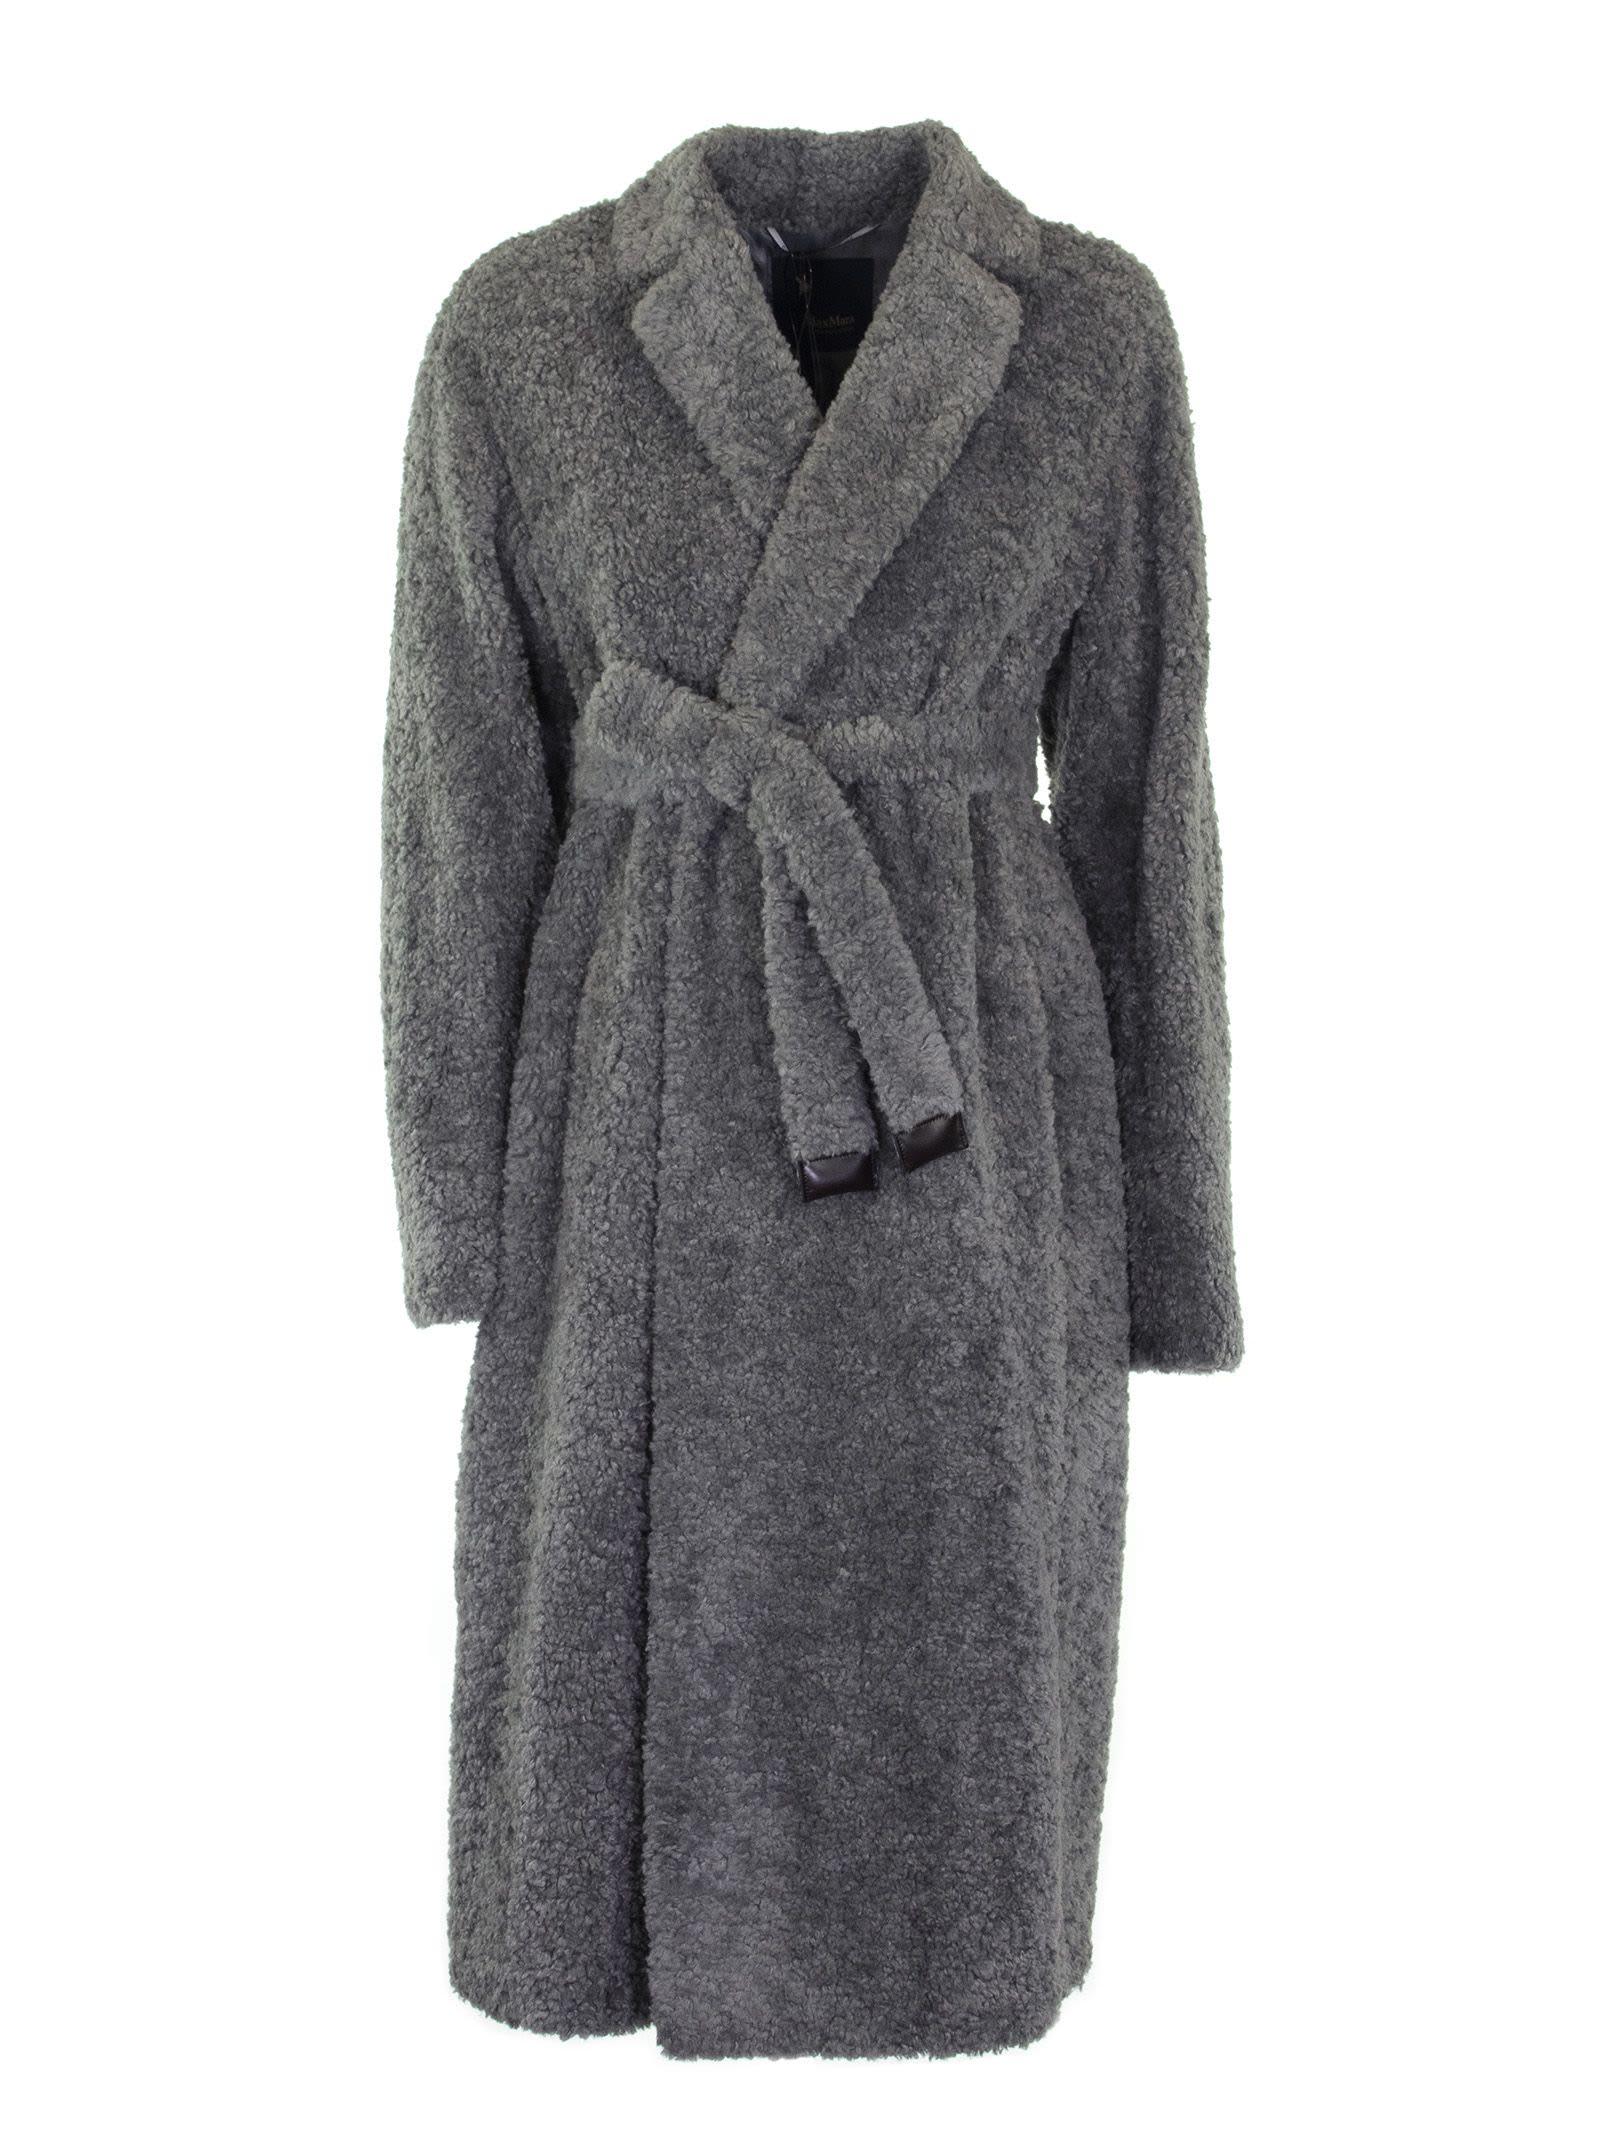 Max Mara Grey Teddy Bear Coat